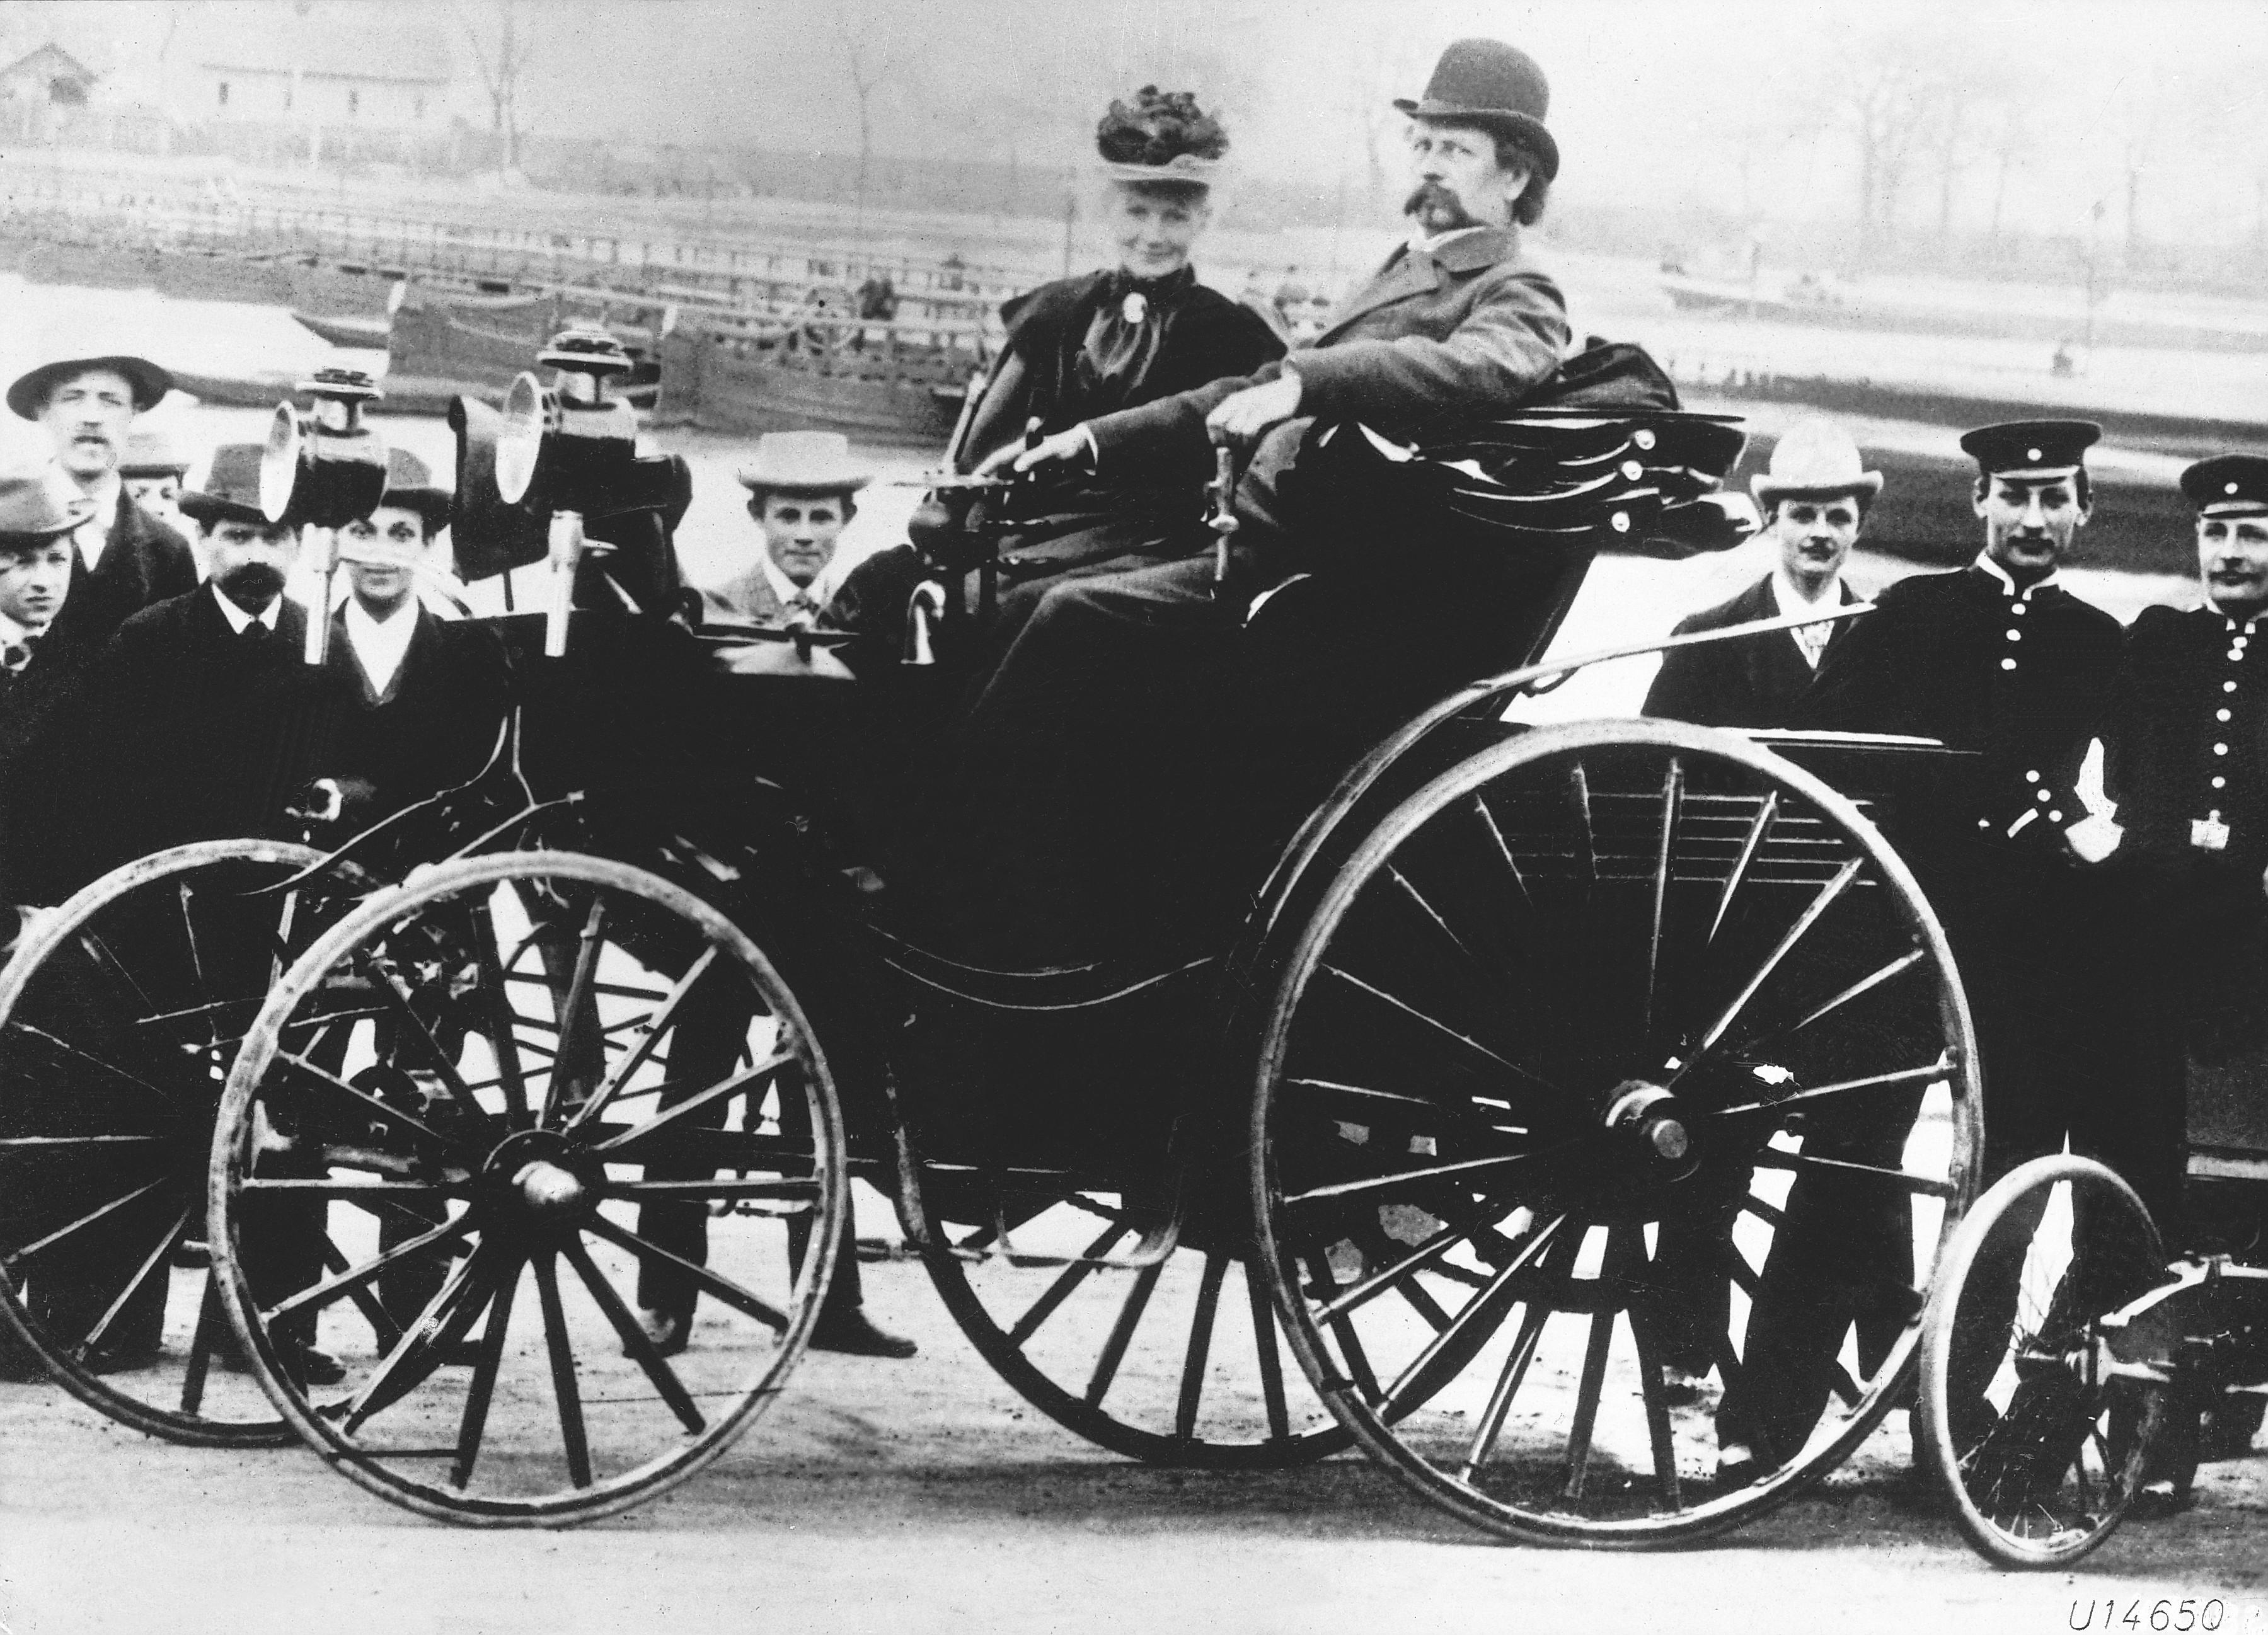 File:Karl Benz Automobile.jpg - Wikimedia Commons